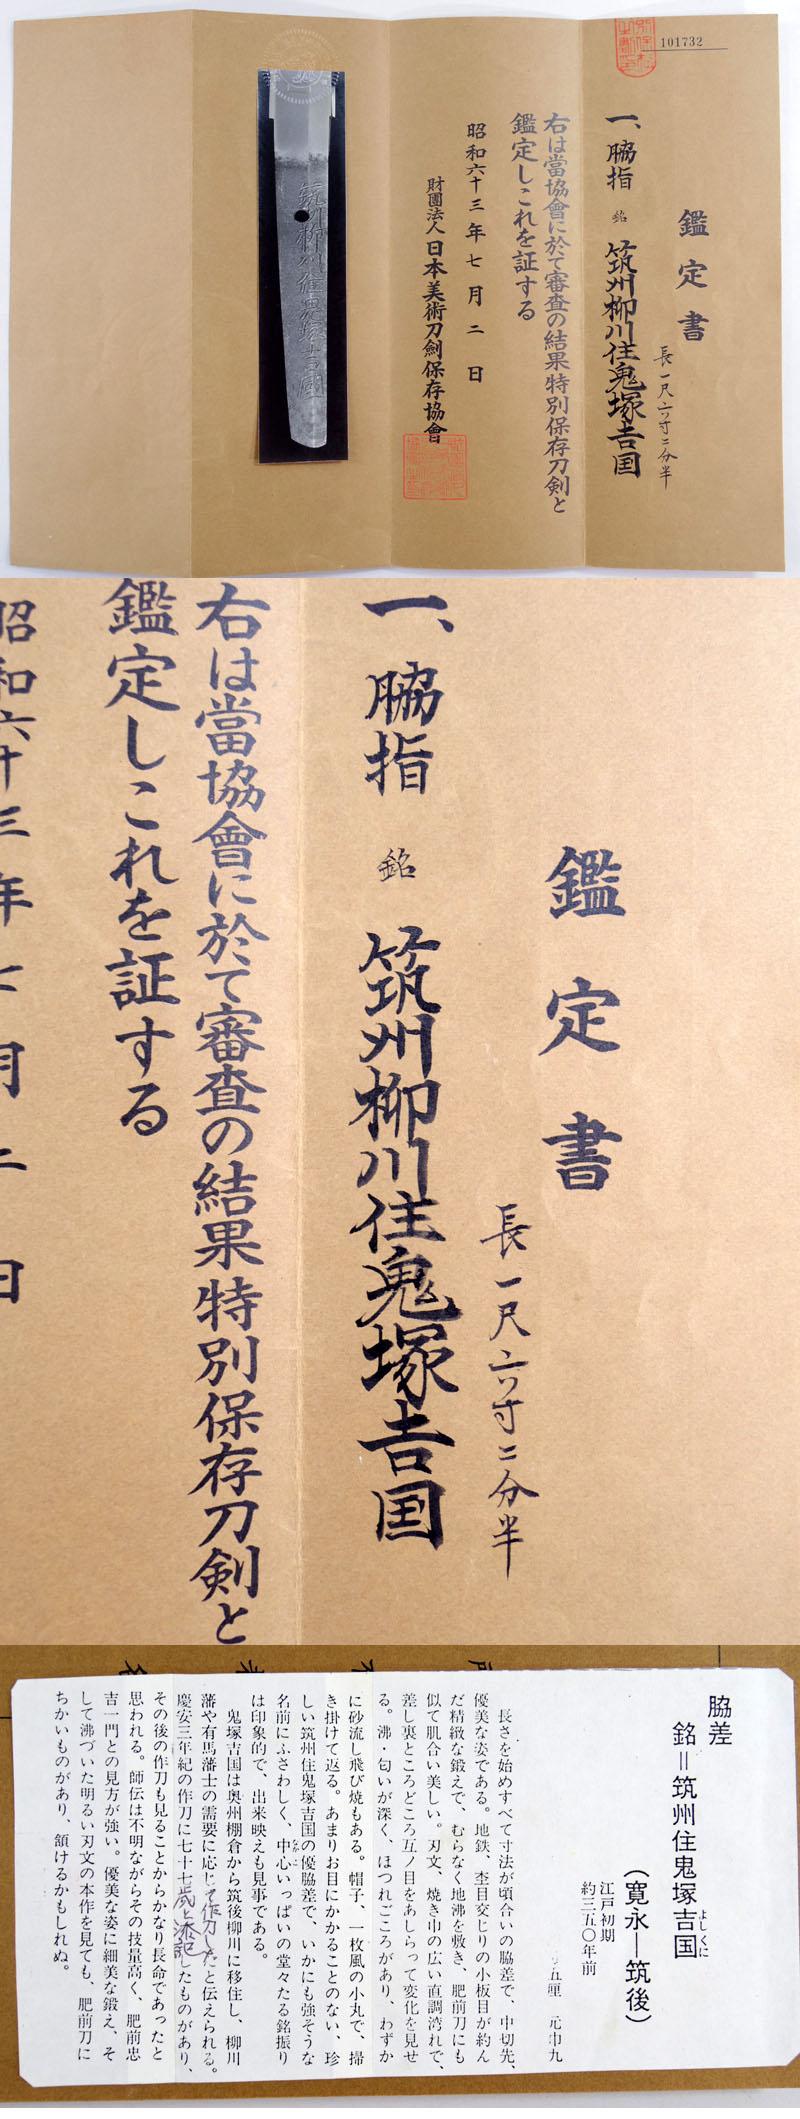 築州柳川住鬼塚吉国 Picture of Certificate